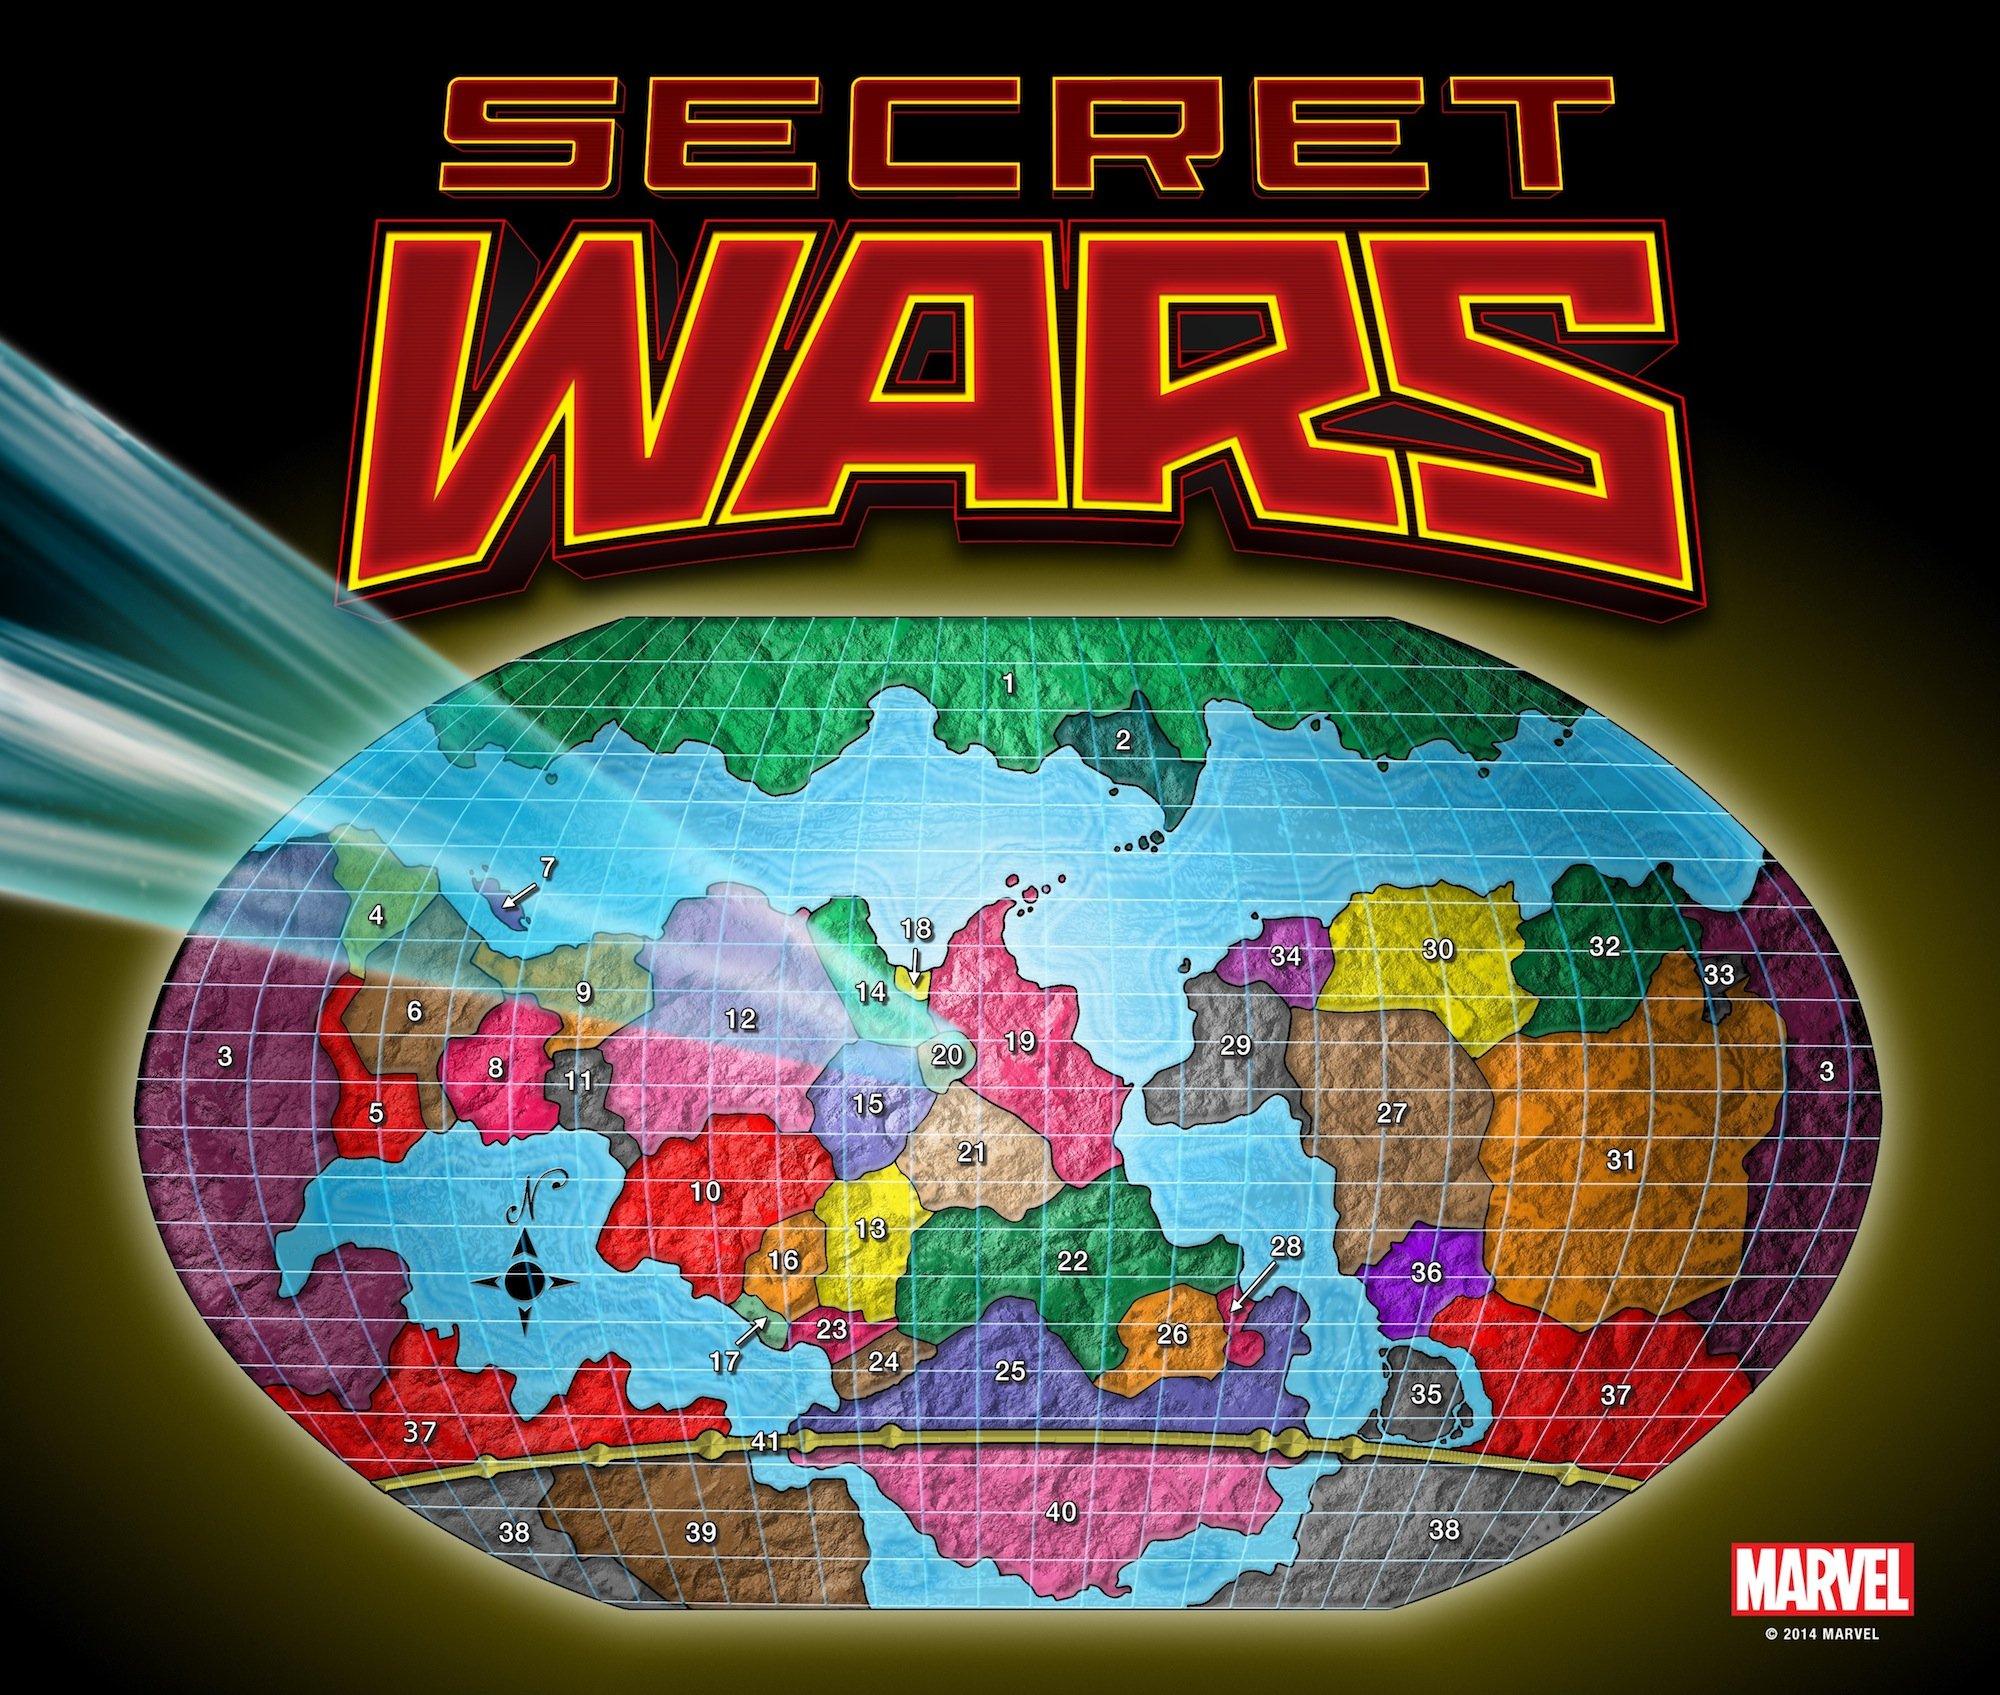 Best Wallpaper Marvel Secret Wars - 3b9e0a664e2a2b0609d222b3f0ab8a8b  Perfect Image Reference_597236.jpg